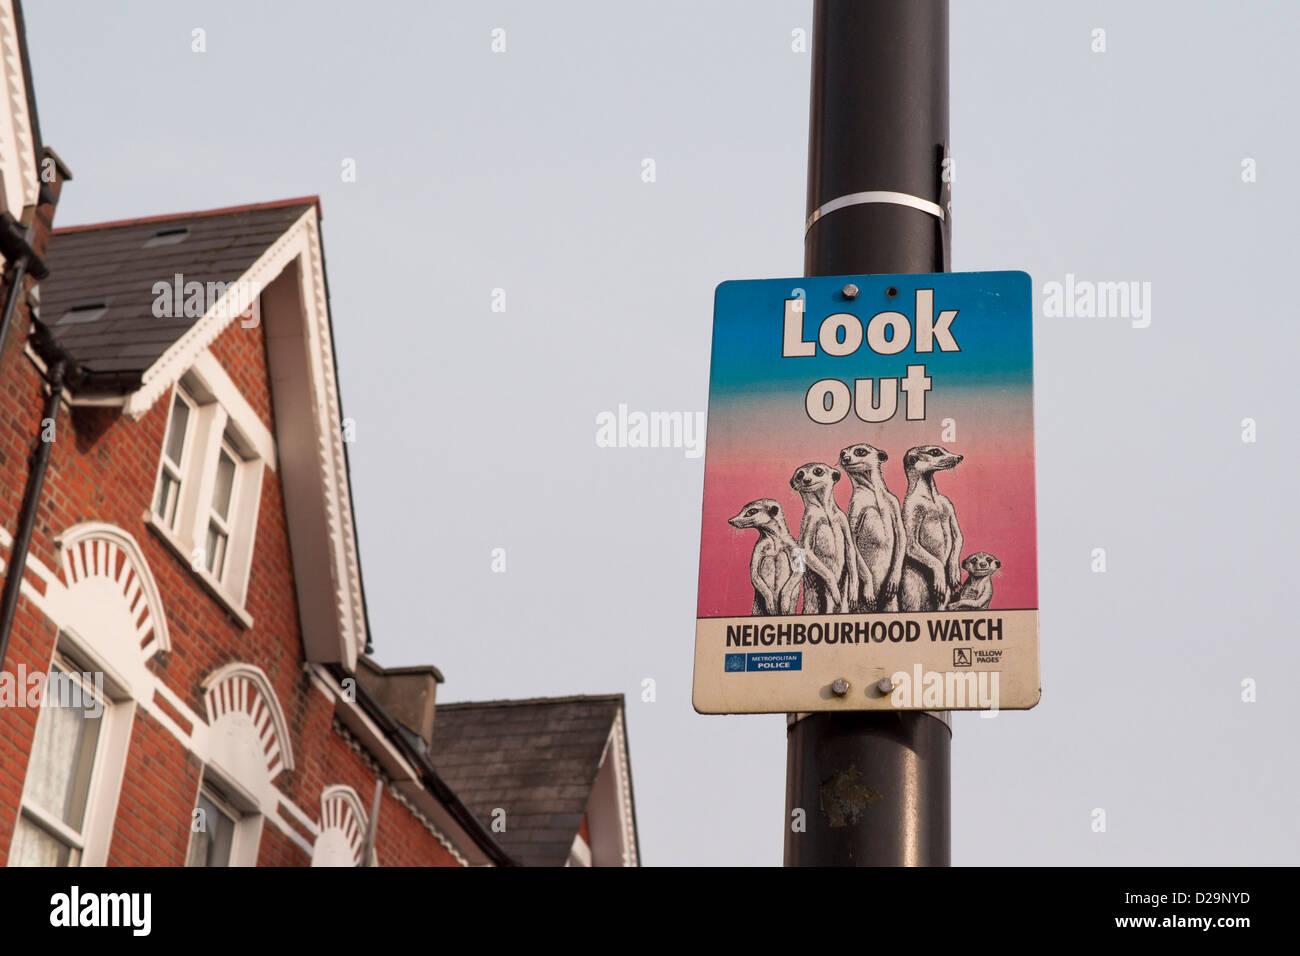 Neighbourhood watch sign on a lamppost on Endymion Road, Haringey, London UK. - Stock Image